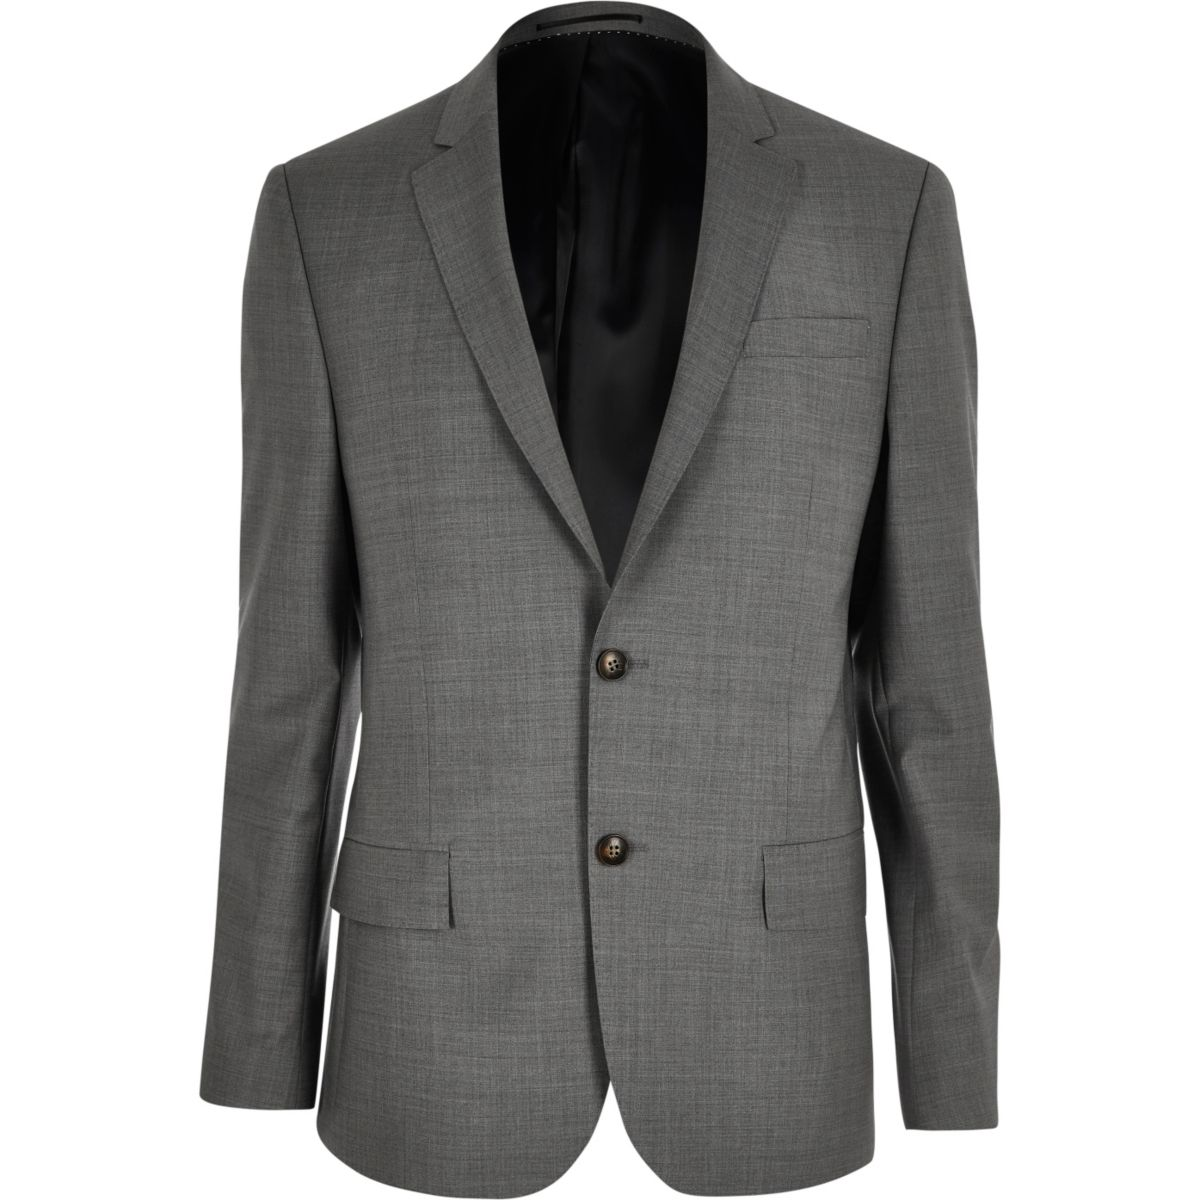 Grey slim Travel Suit jacket